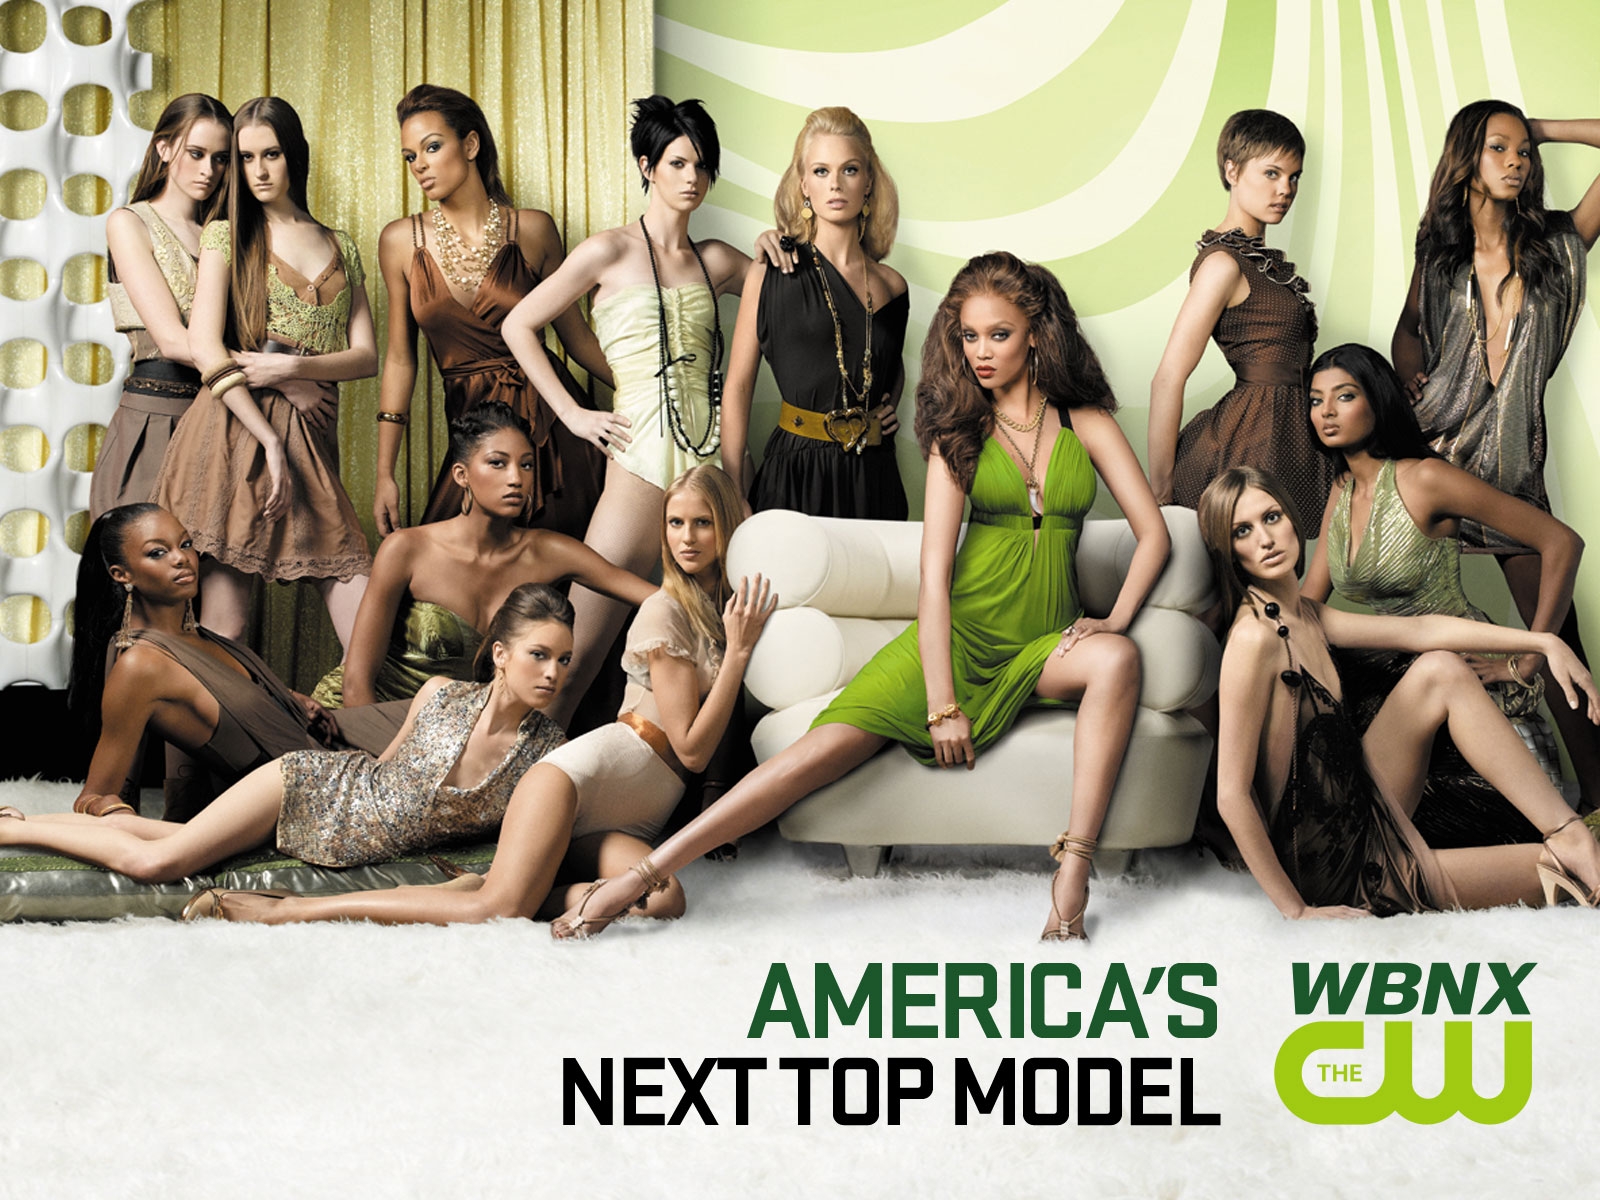 America's Next Top Model 2014